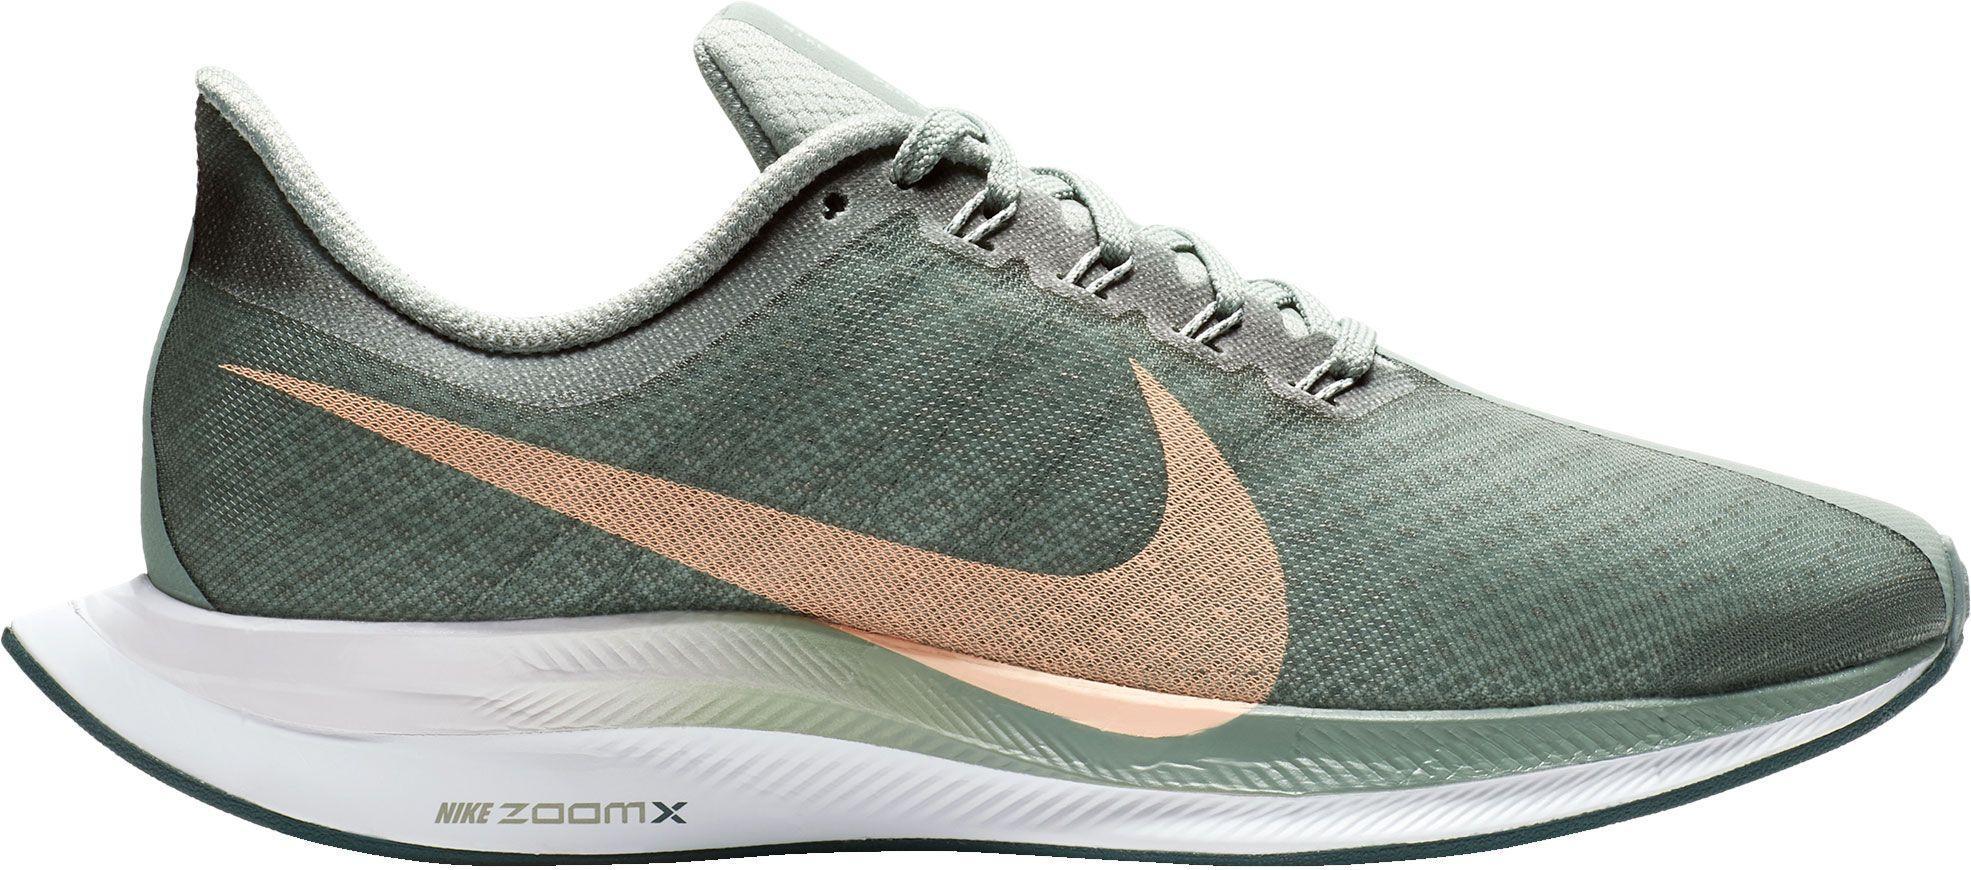 f99ede4e9edd Lyst - Nike Zoom Pegasus 35 Turbo Running Shoes in Green